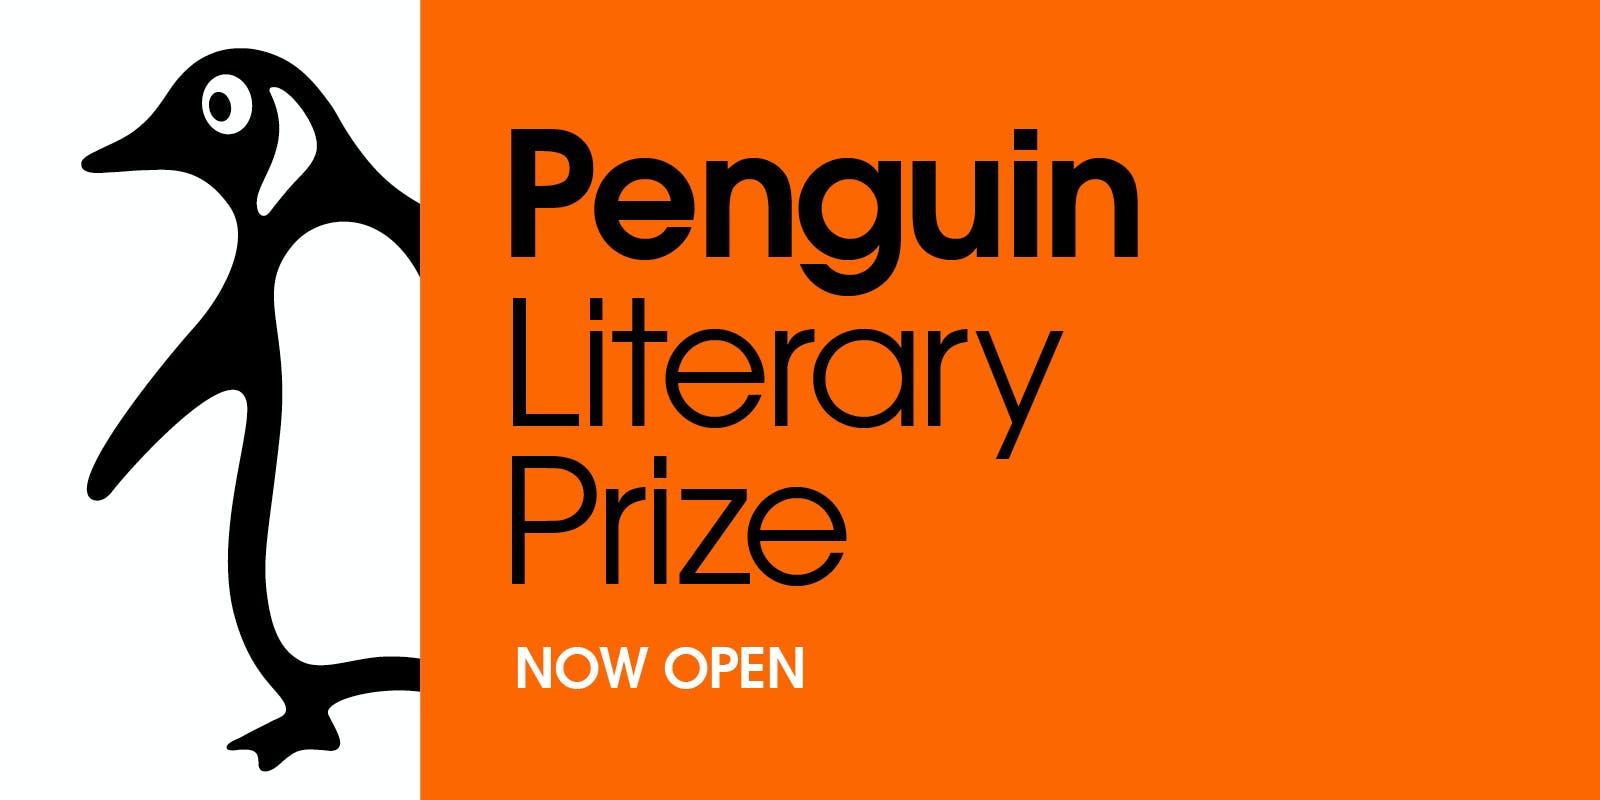 Penguin Literary Prize 2020